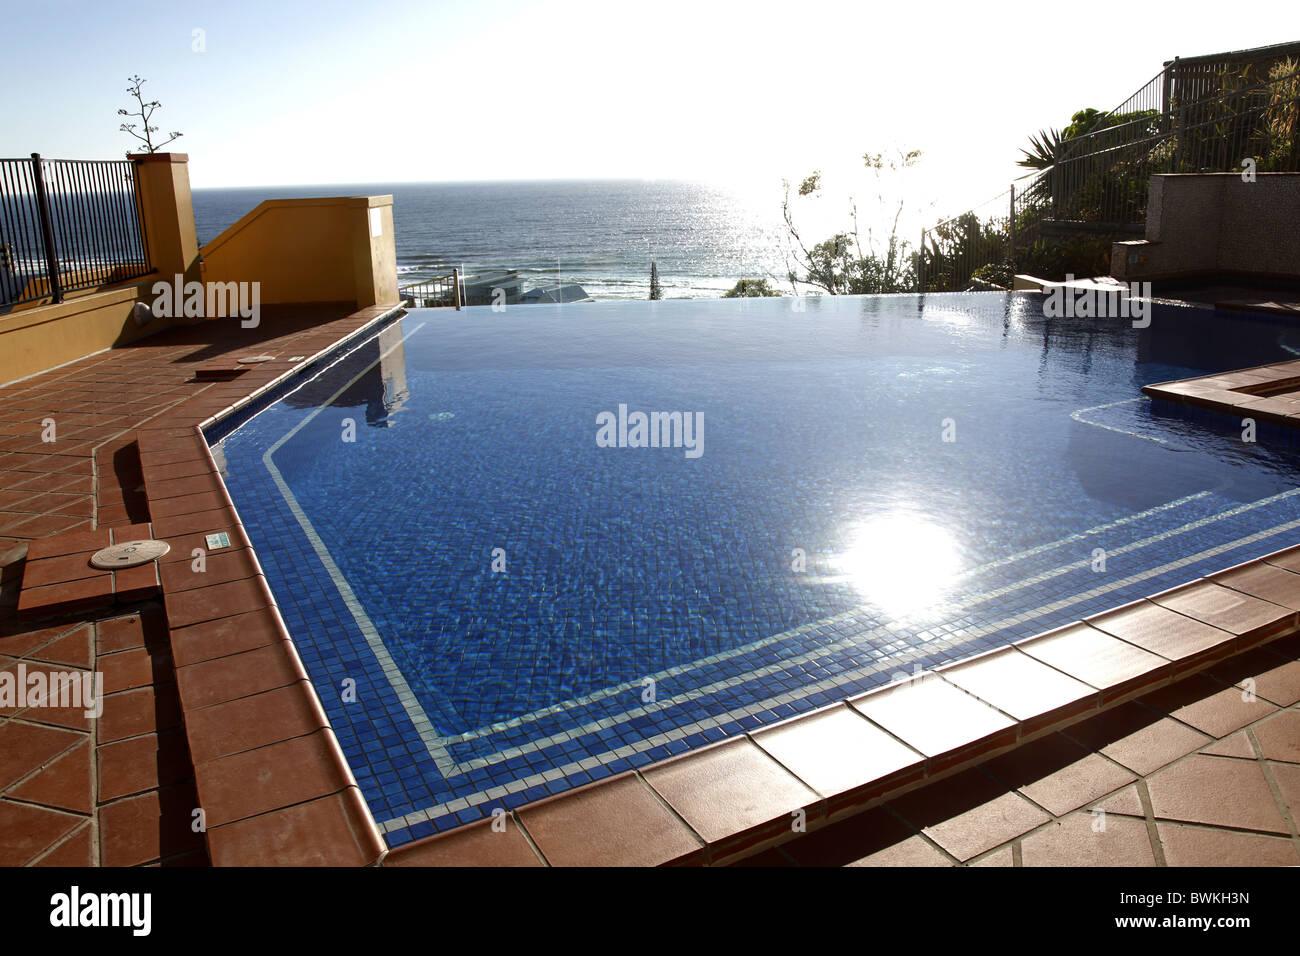 Australia, Queensland, Gold Coast, Magic Mountain Resort Pool and Pacific Ocean - Stock Image